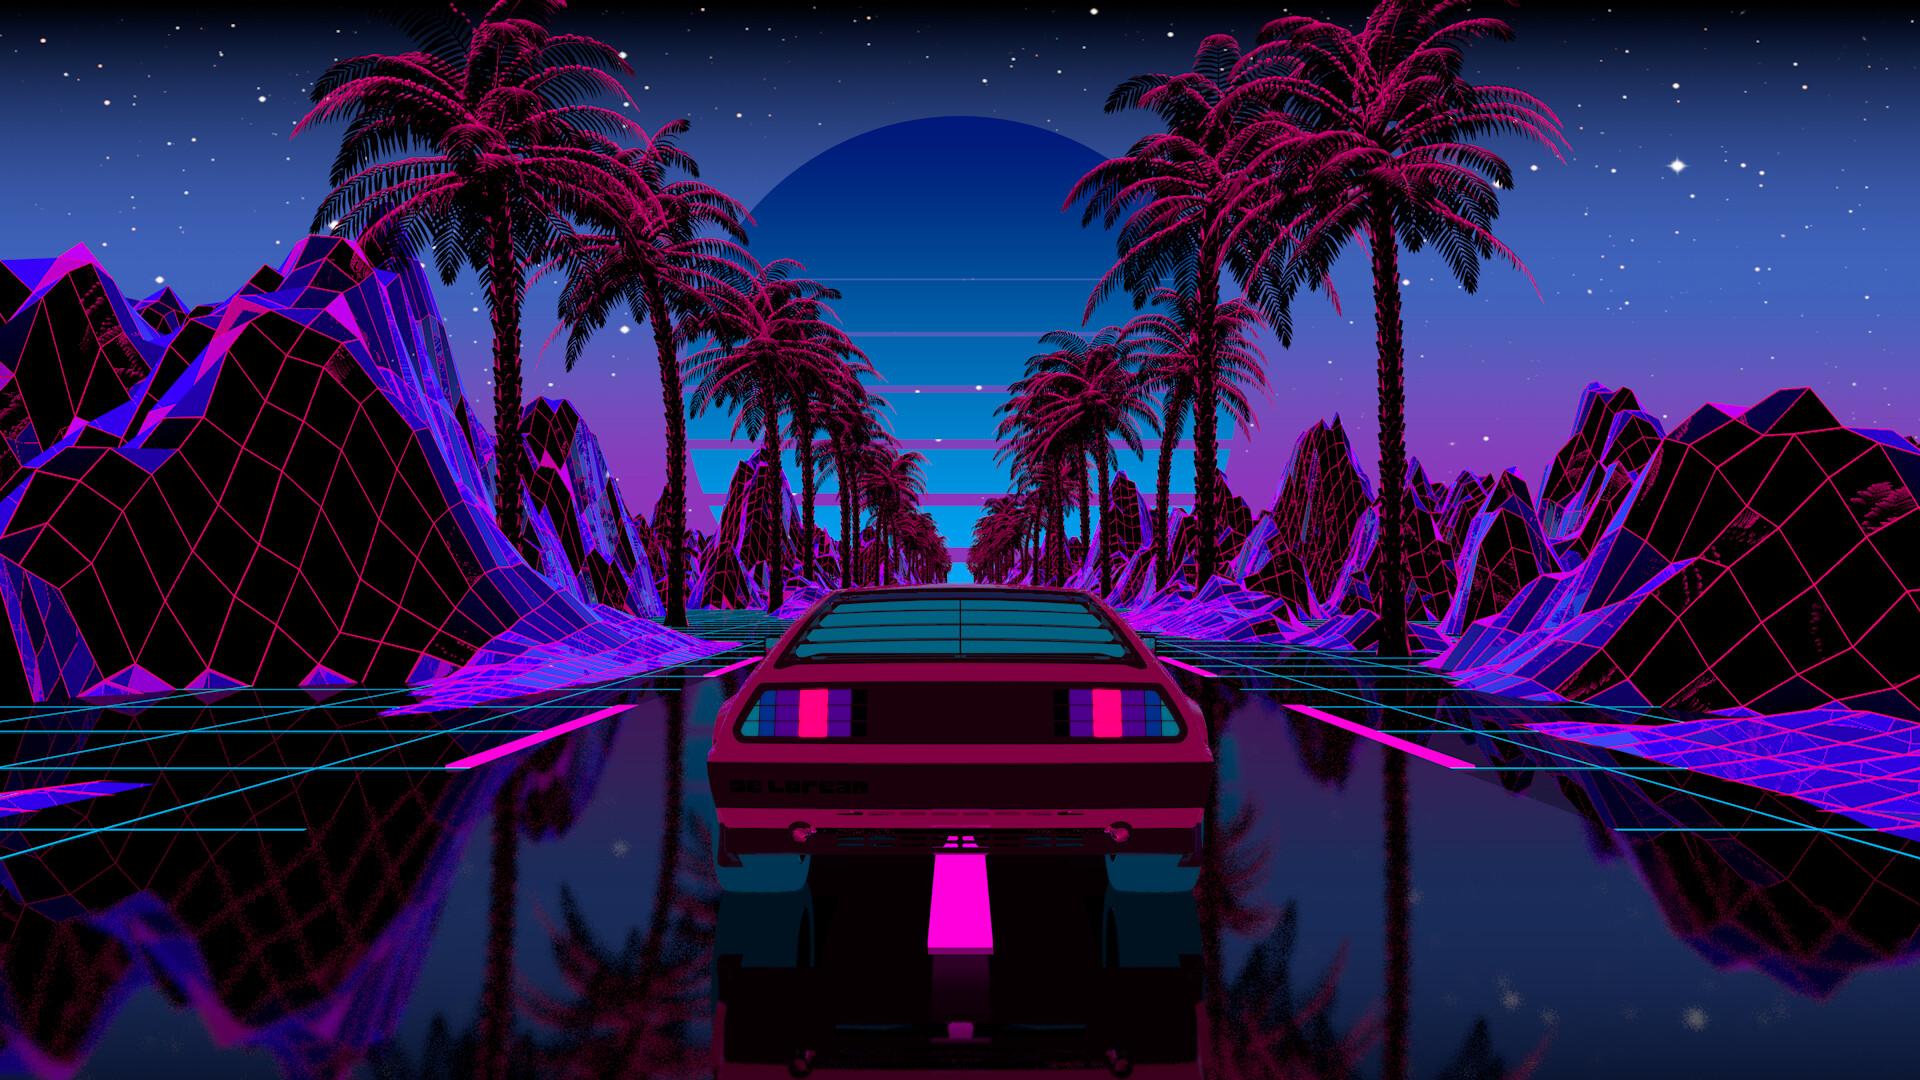 Wallpaper Outrun Car Vehicle Transport Palm Trees Cyber Reflection Sun Purple Pink Cyan Digital Artwork Illustration Evening Neon Landscape Nature Mountains Vaporwave Synthwave Retrowave 1920x1080 Francazo 1853305 Hd